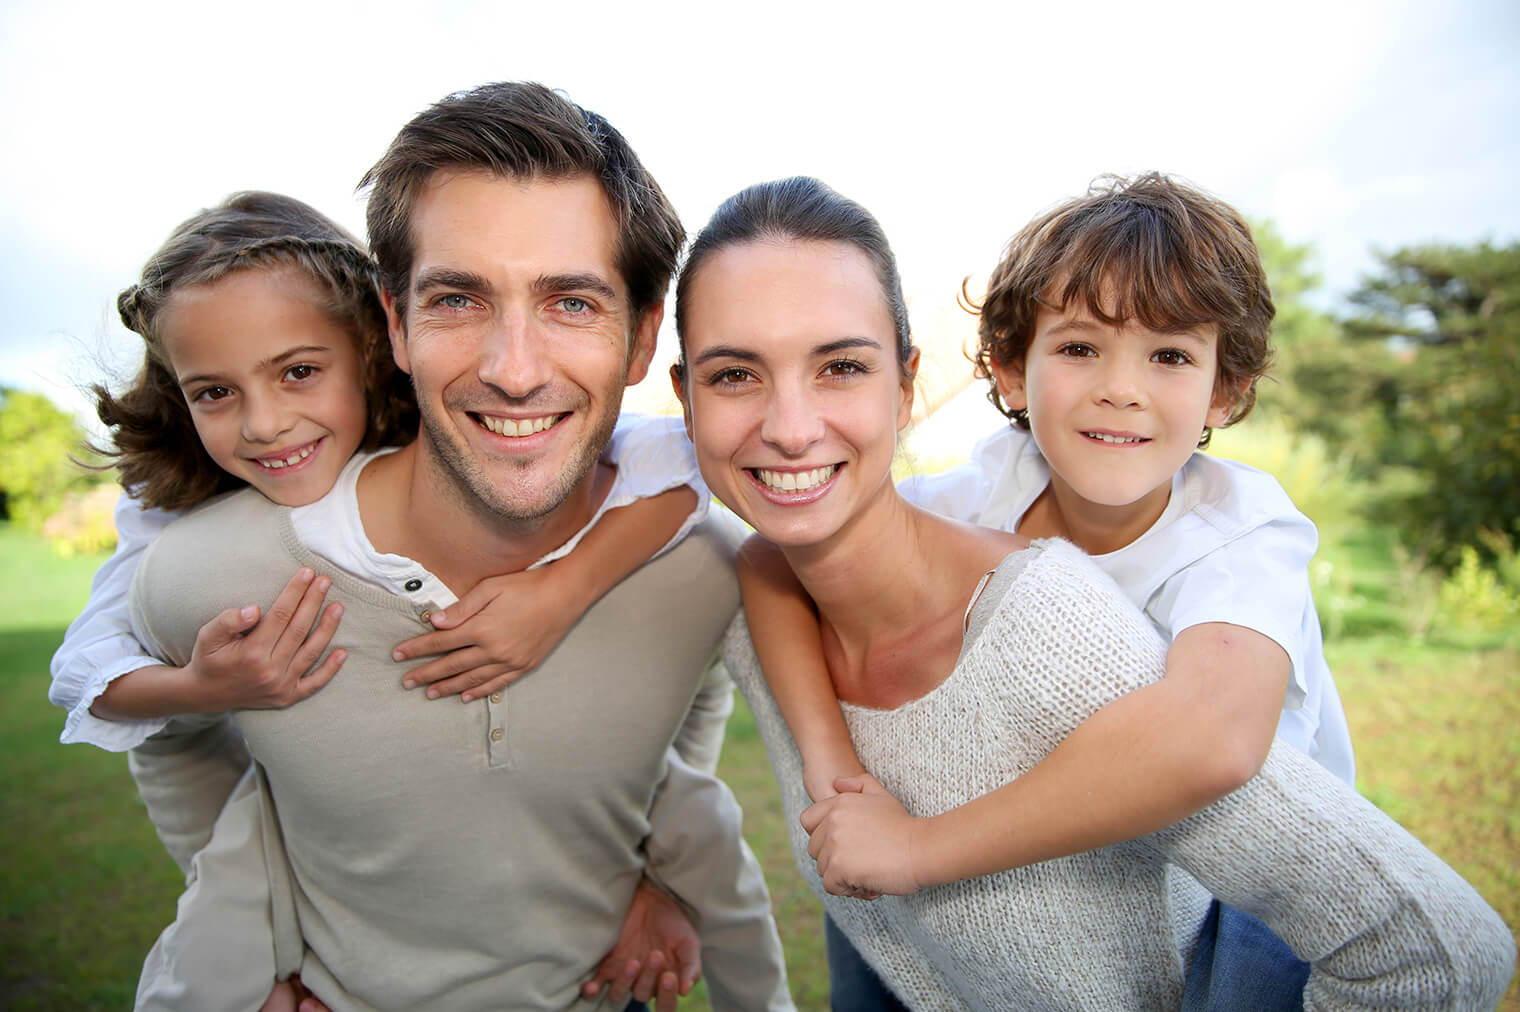 Feroglobin family of four